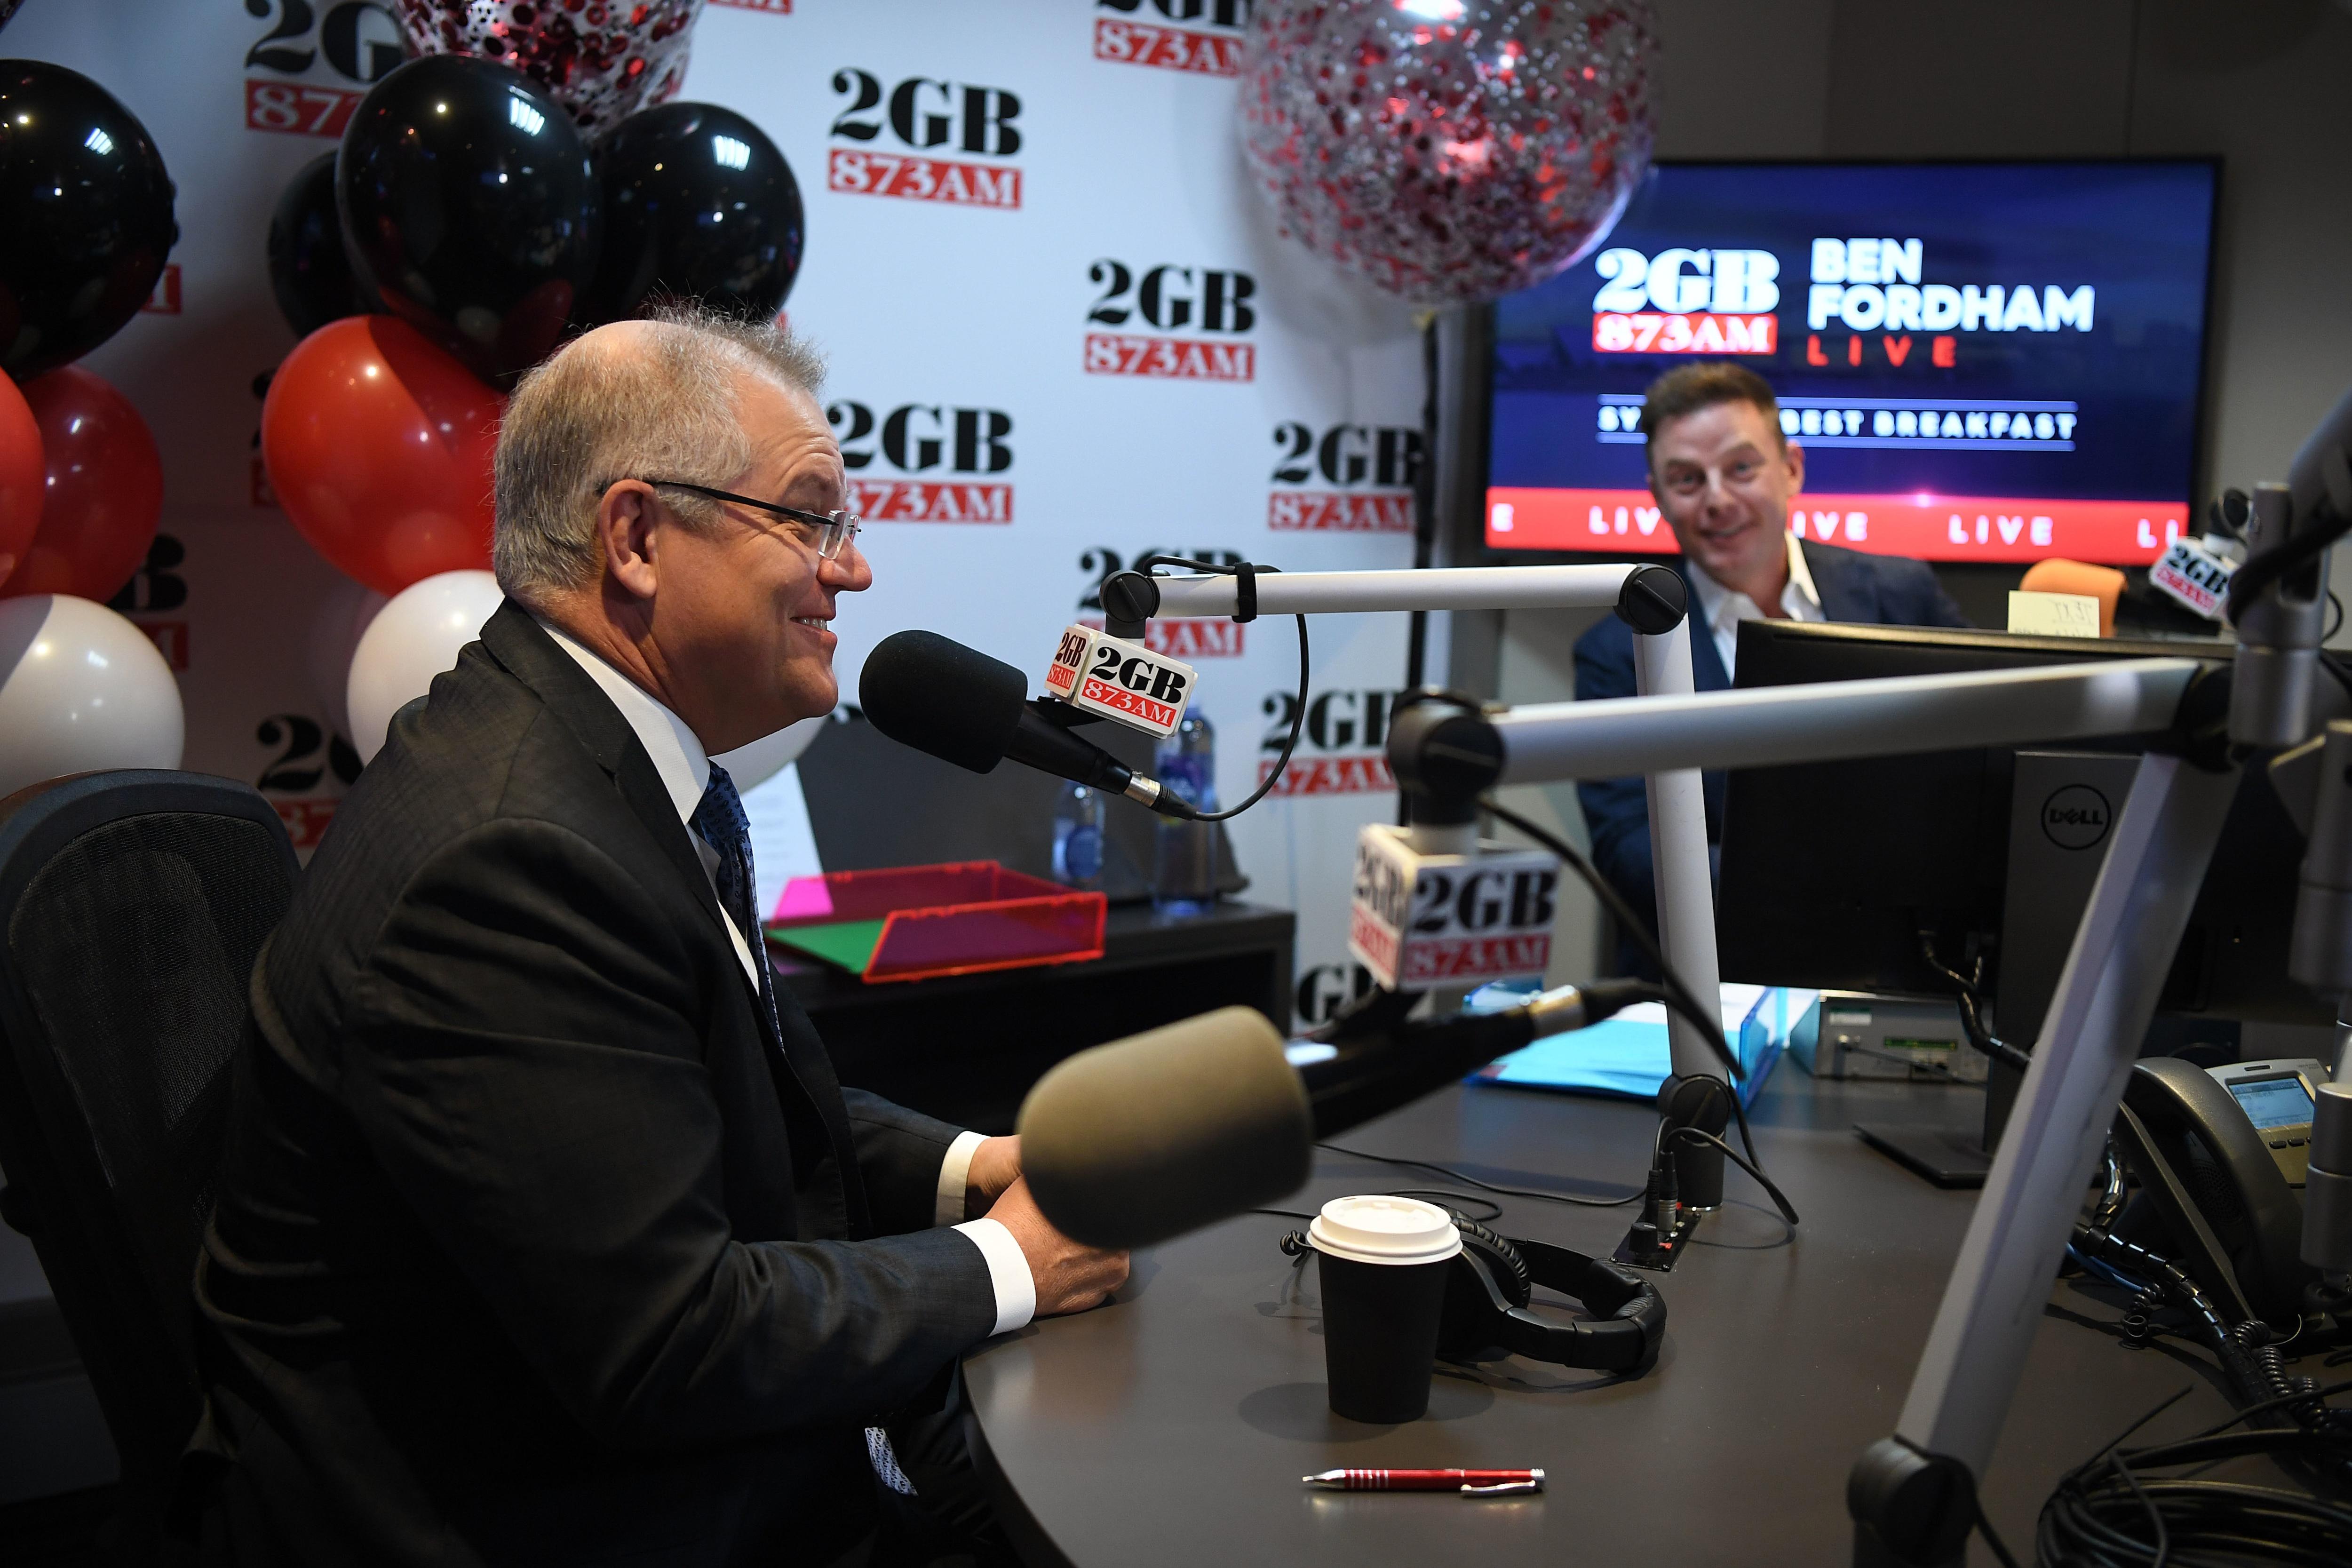 Prime Minister Scott Morrison in the 2GB studio.